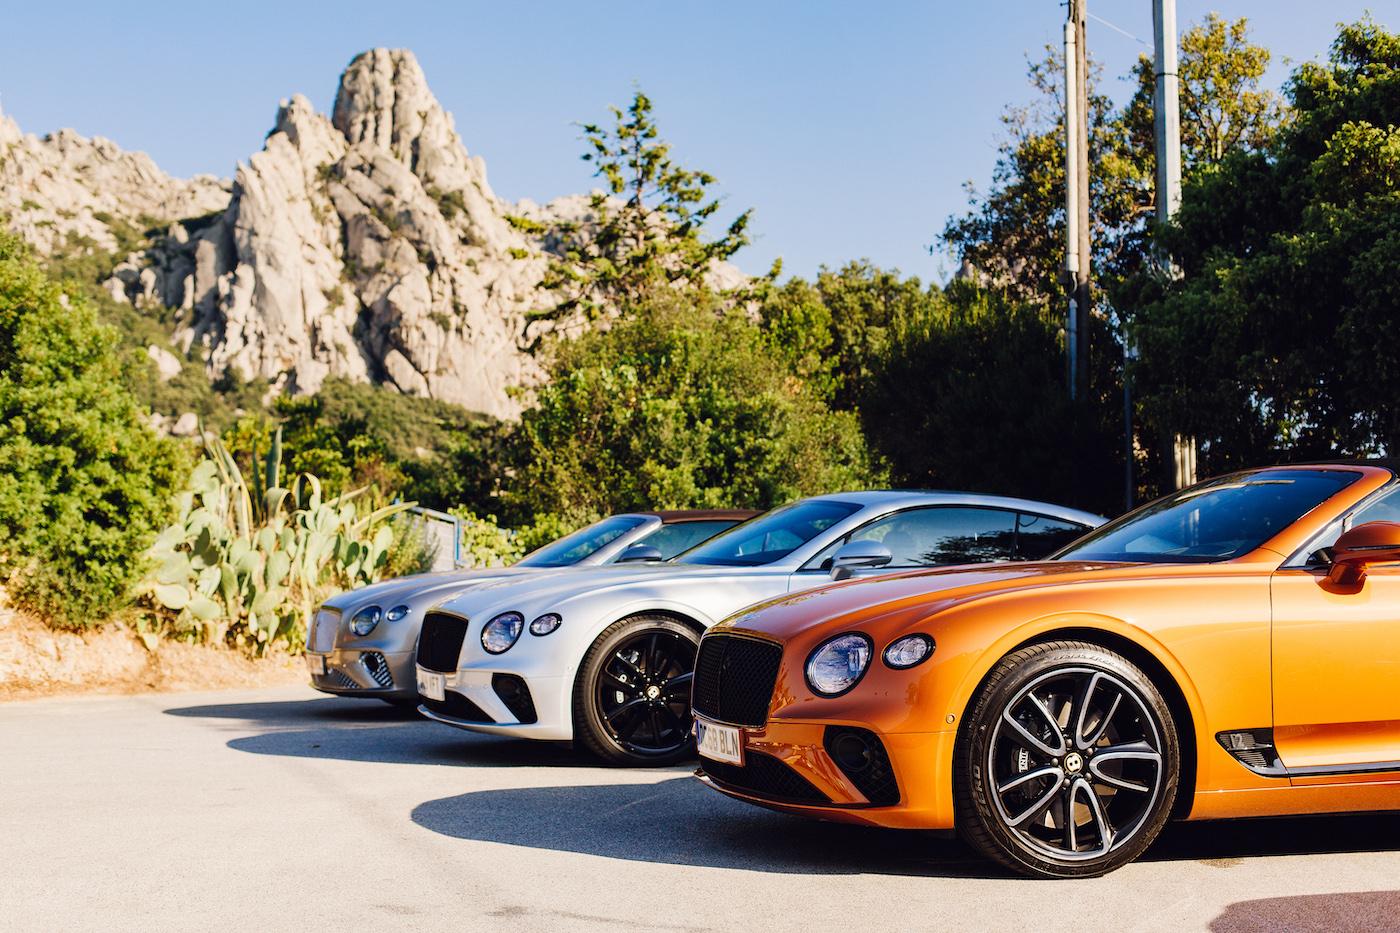 Mit Bentley in Porto Cervo: Die Bentley Summer Tour 2019 17